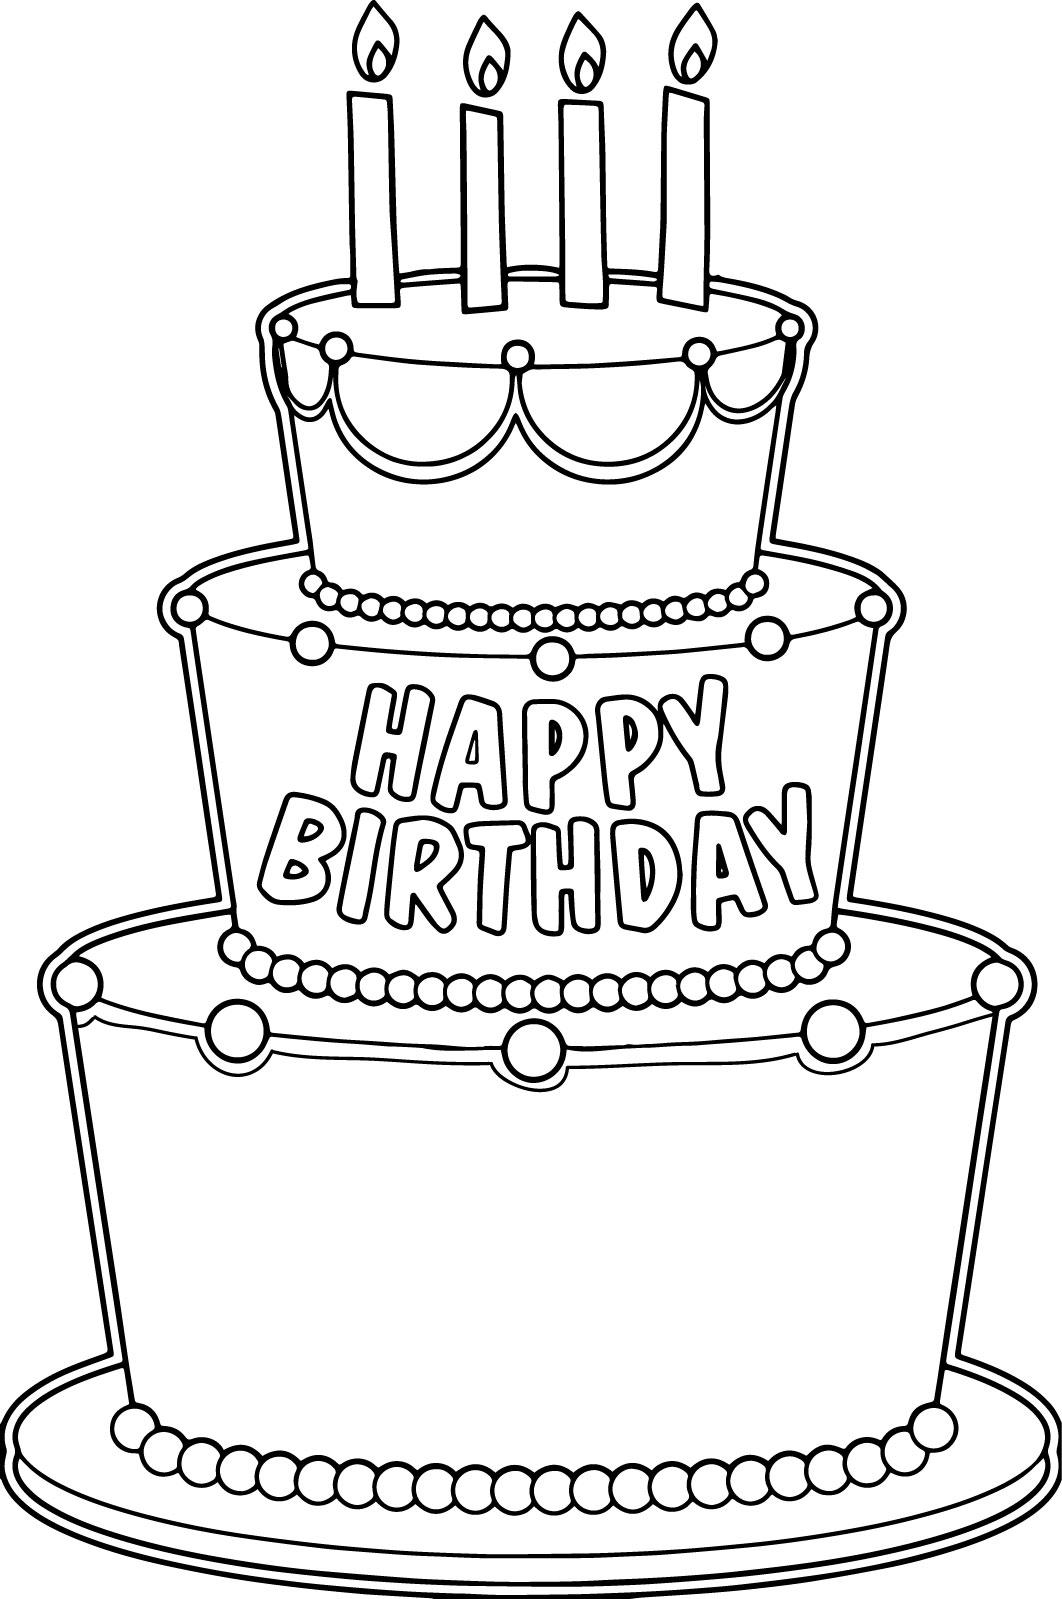 Big Birthday Cake Coloring Page Wecoloringpage